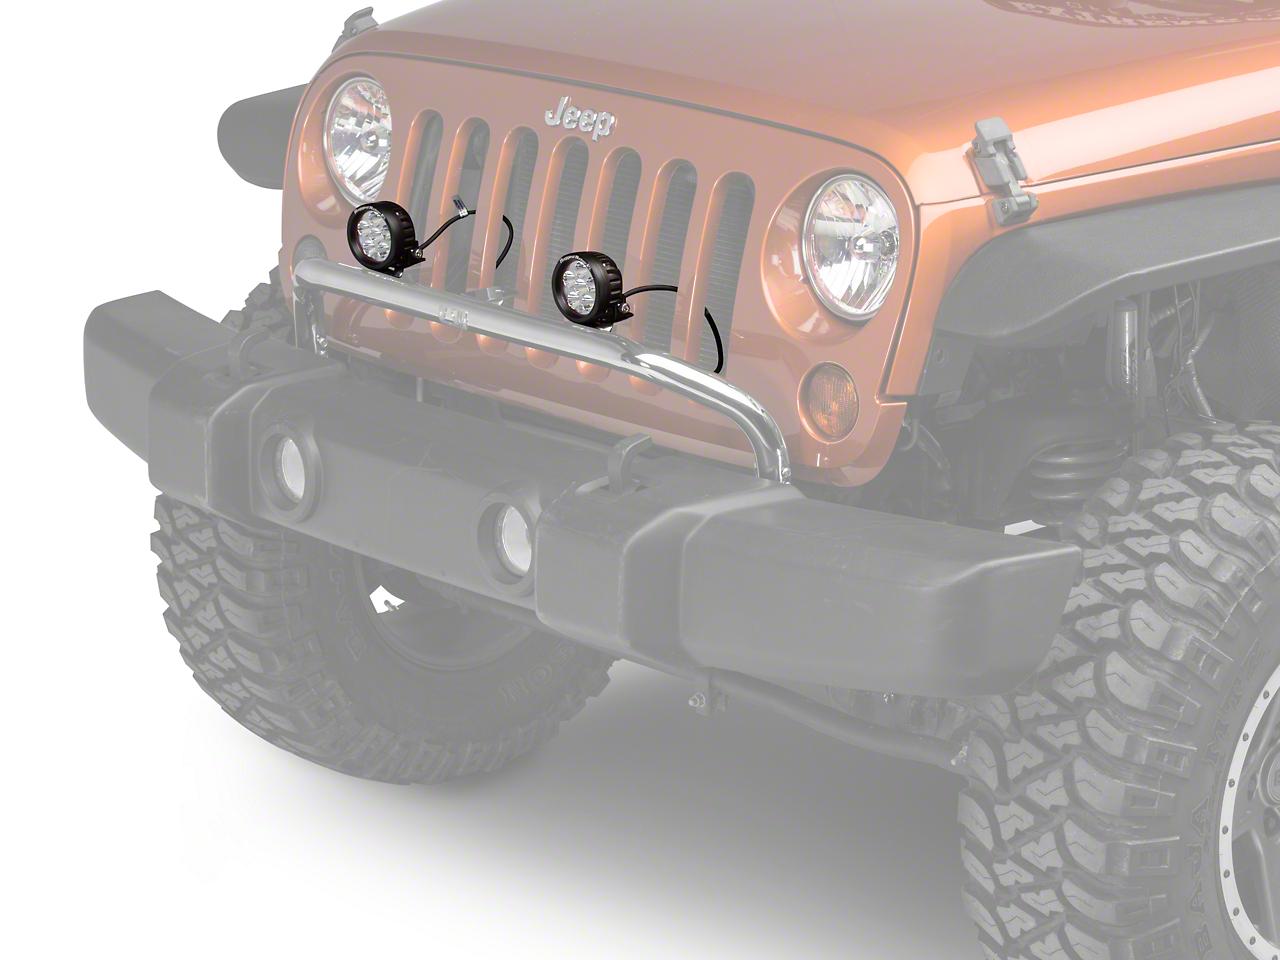 Rugged Ridge 3.5 in. Round LED Lights w/ Stainless Steel Front Bumper Light Bar (07-18 Jeep Wrangler JK)